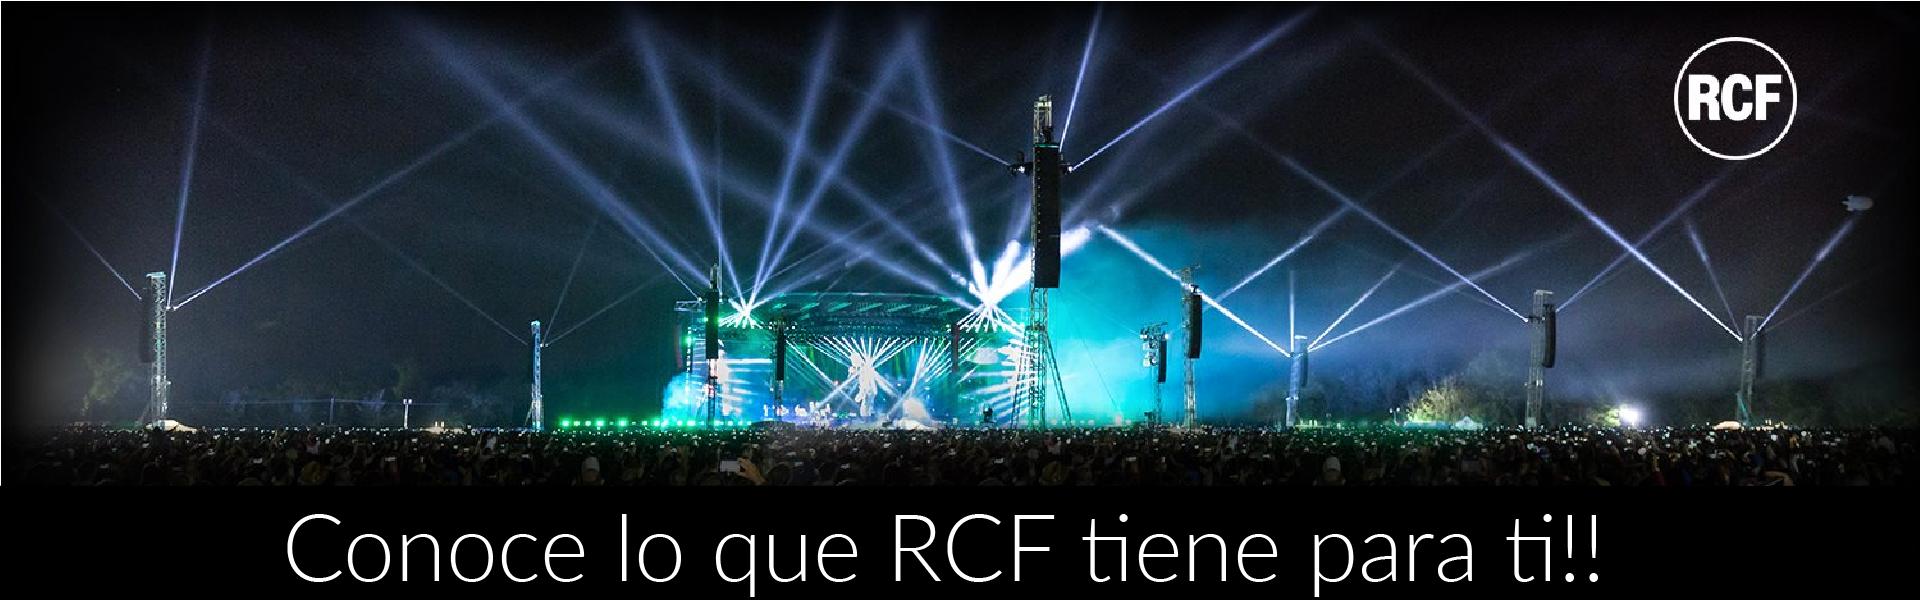 rcf2-03